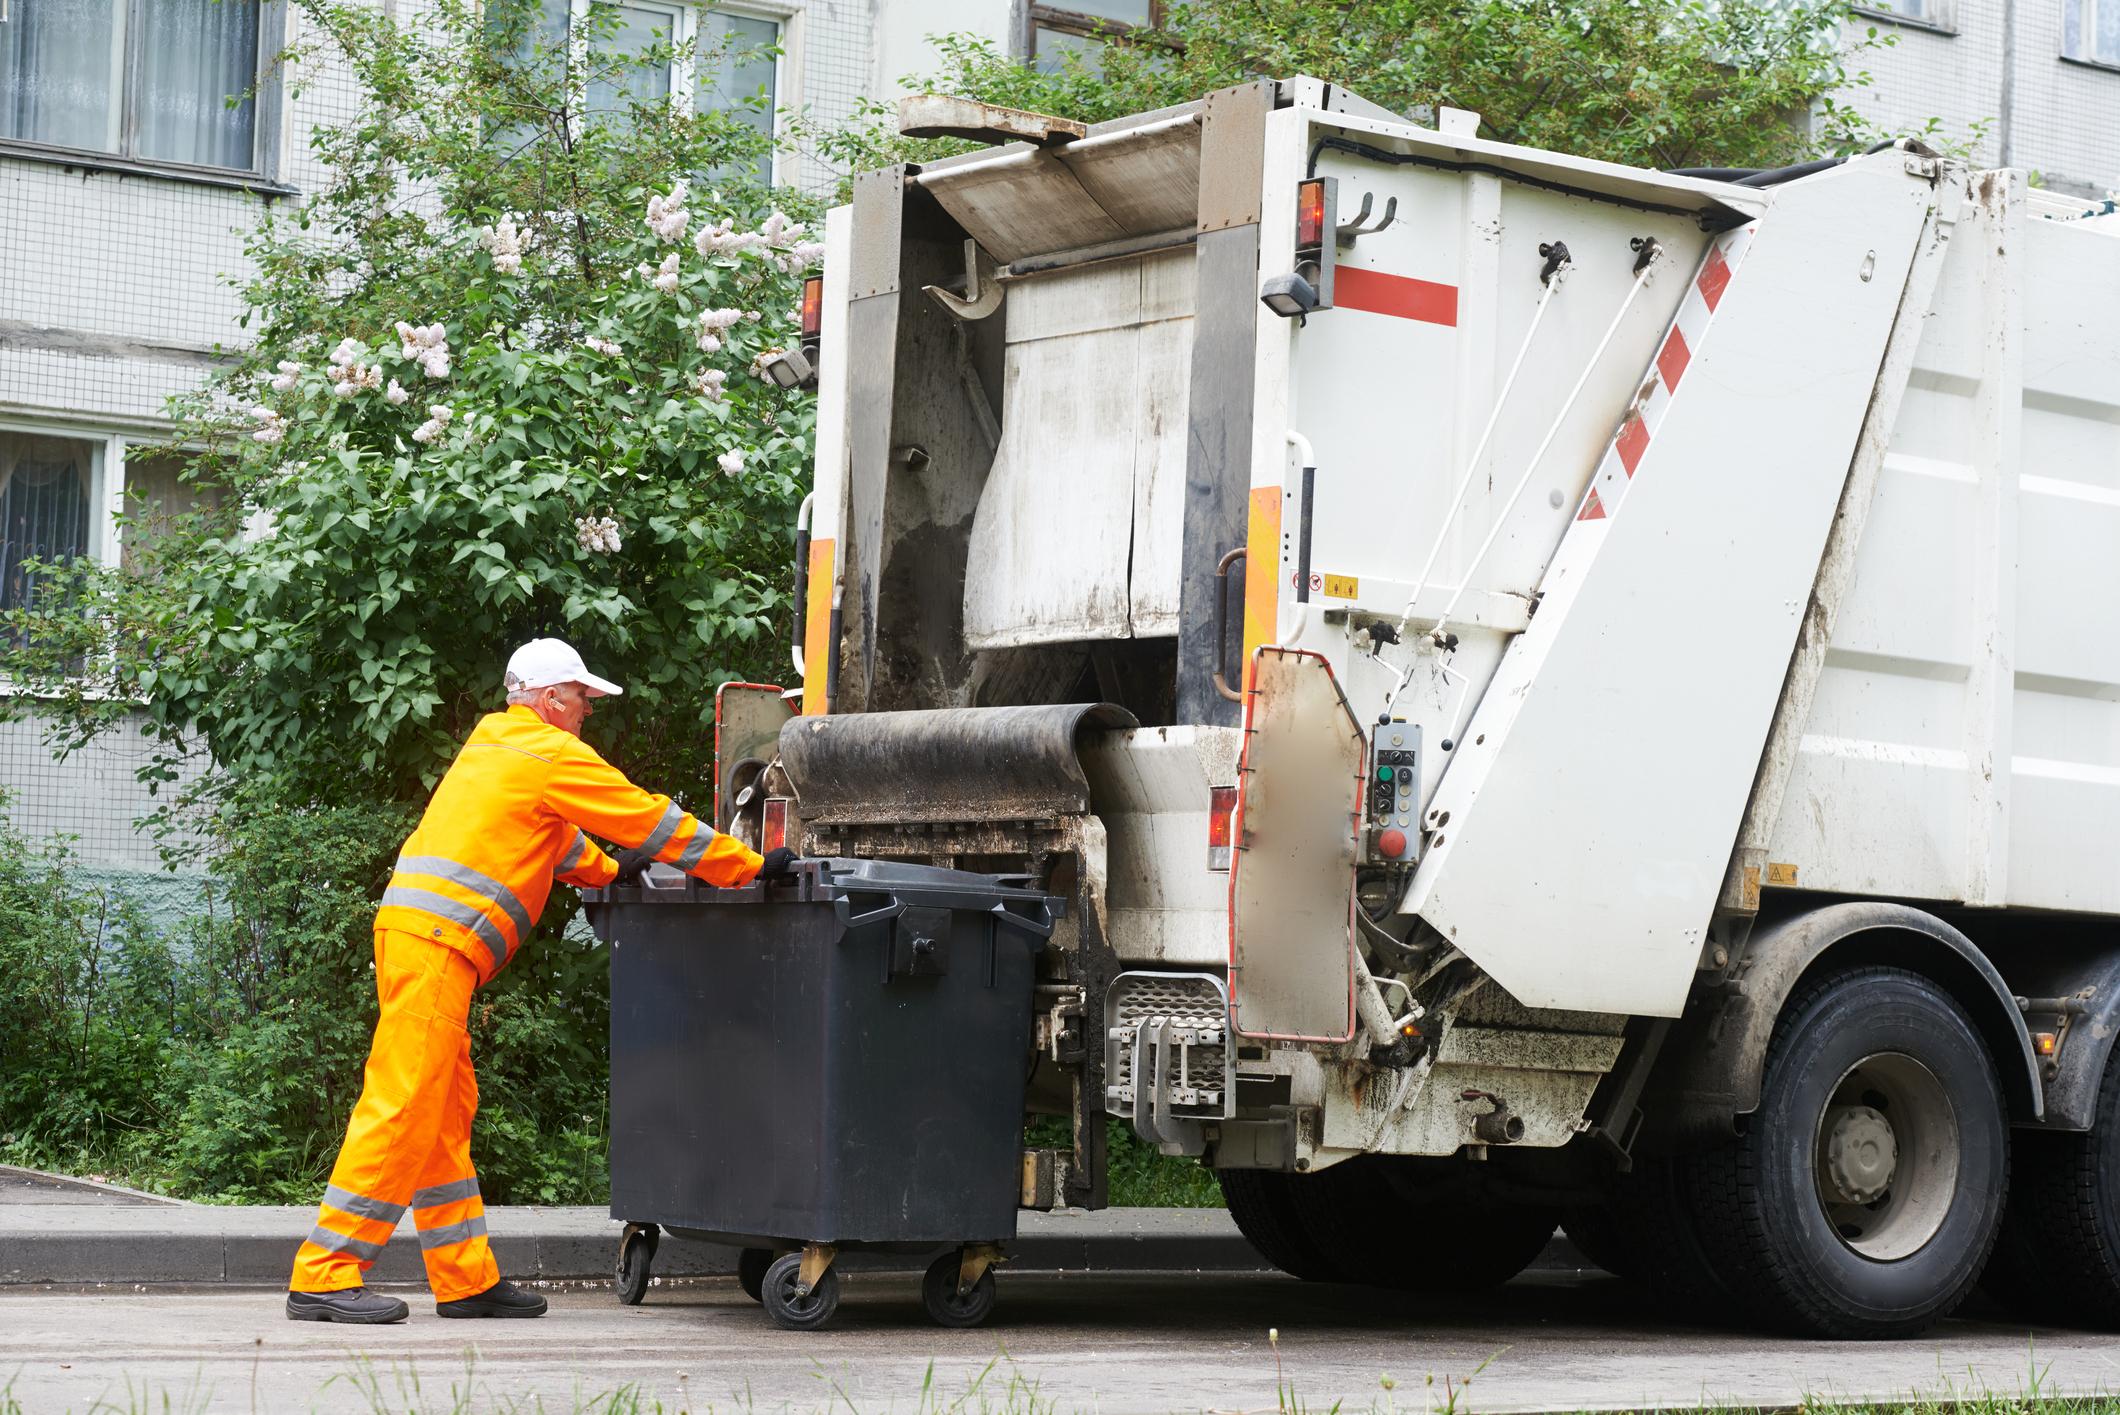 Garbage man and trash truck